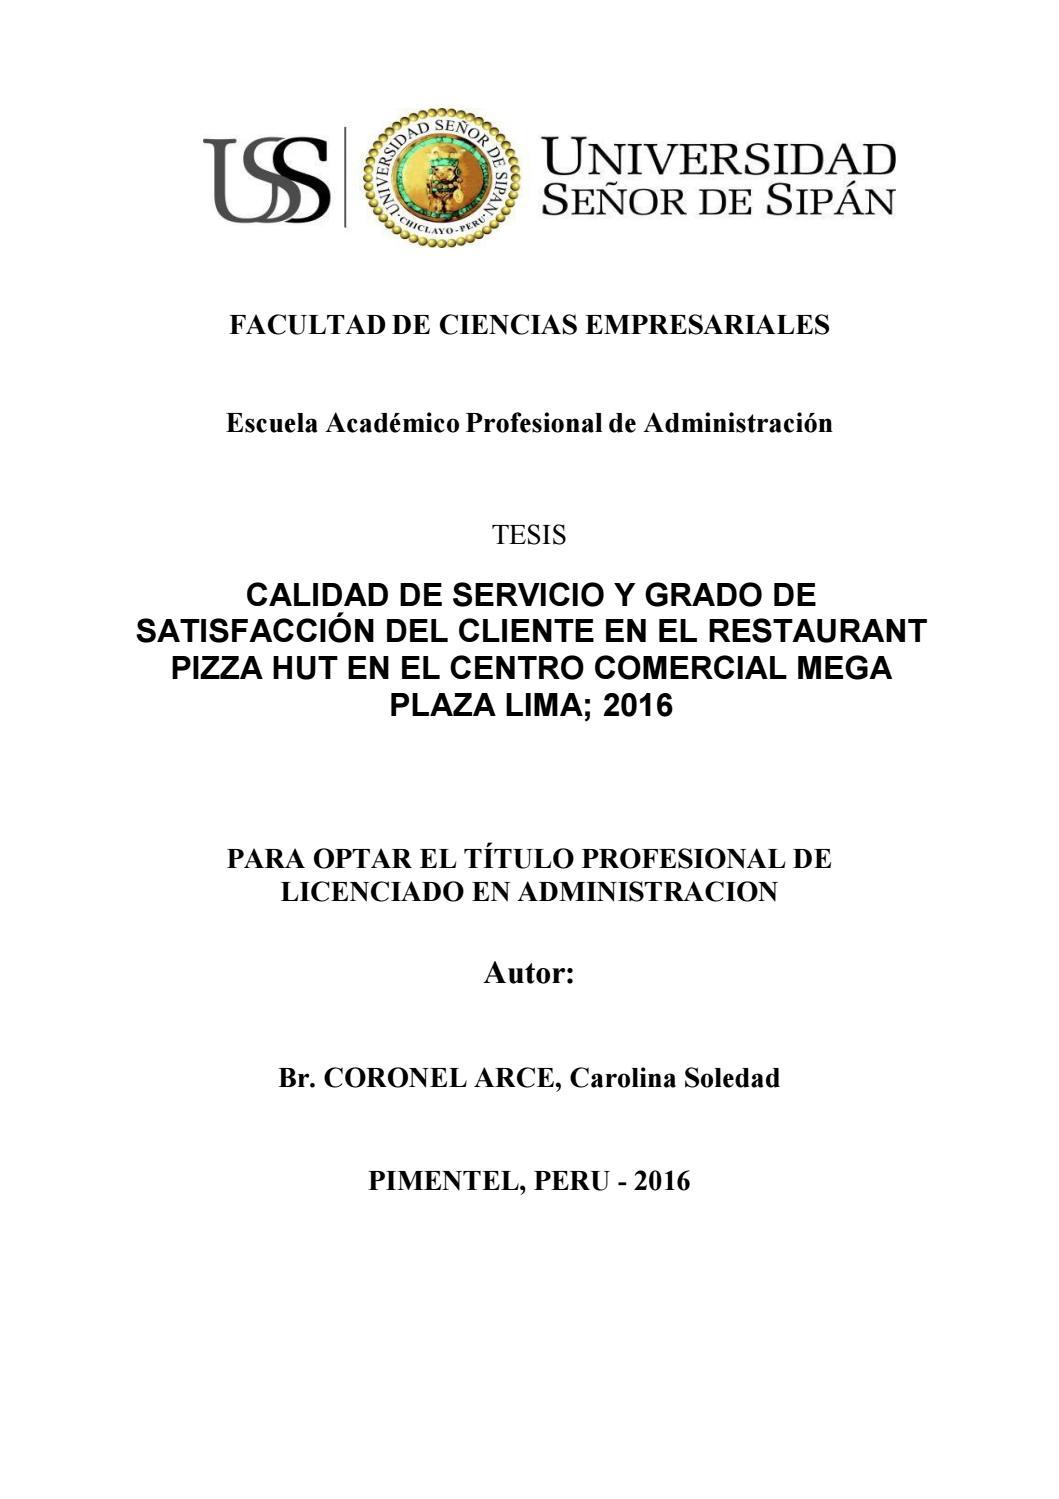 Carolina soledad coronel arce tesis copia by Gustavo Carretero ...